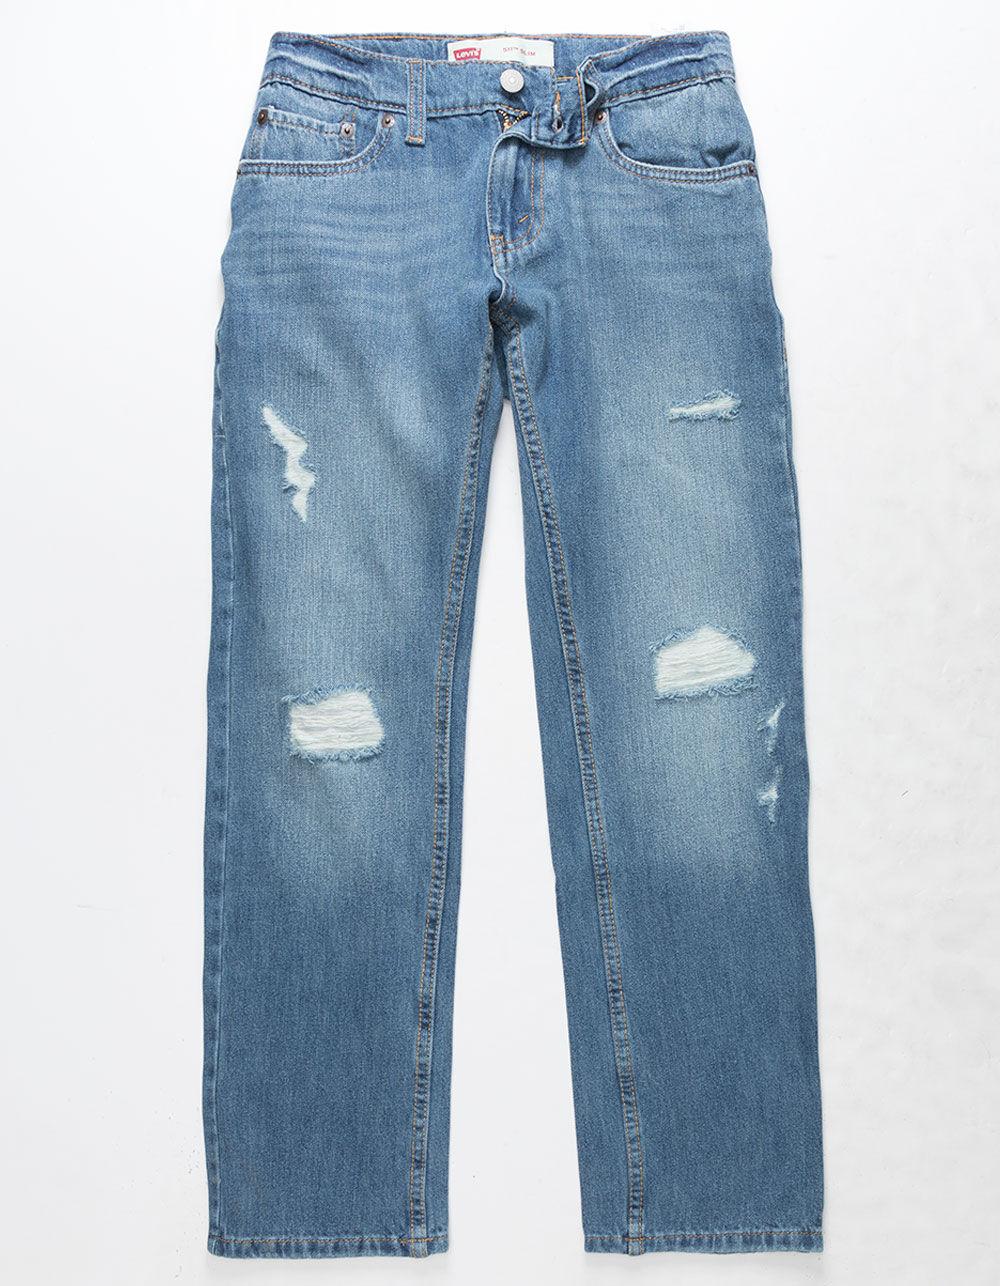 LEVI'S 511 Slim Warp Stretch Dark Wash Boys Ripped Jeans